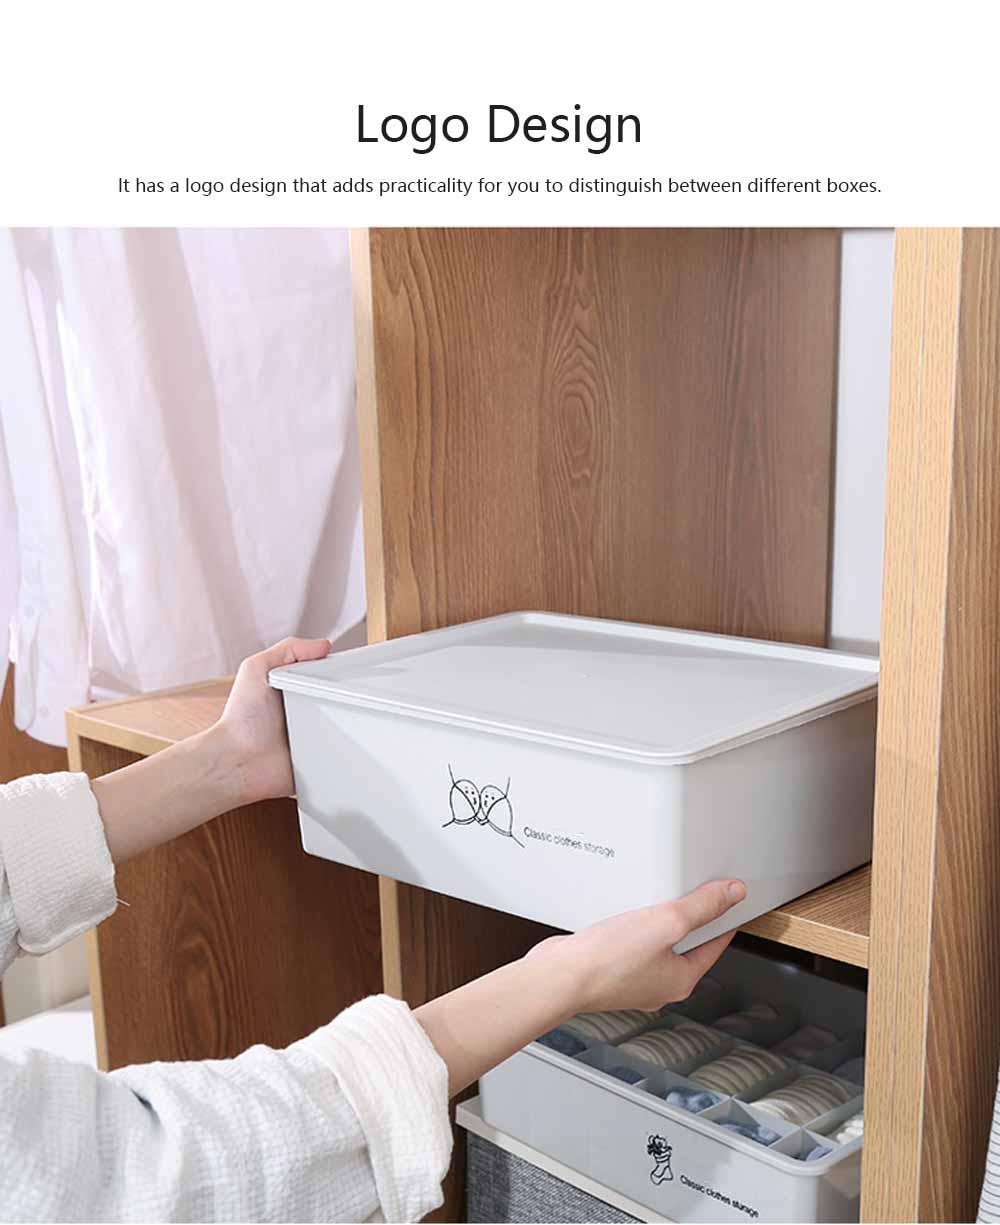 Compartmentalized Storage Boxes Higher Bottom Sunken Design Concise Style Underwear Bra and Socks Storage Cases 2